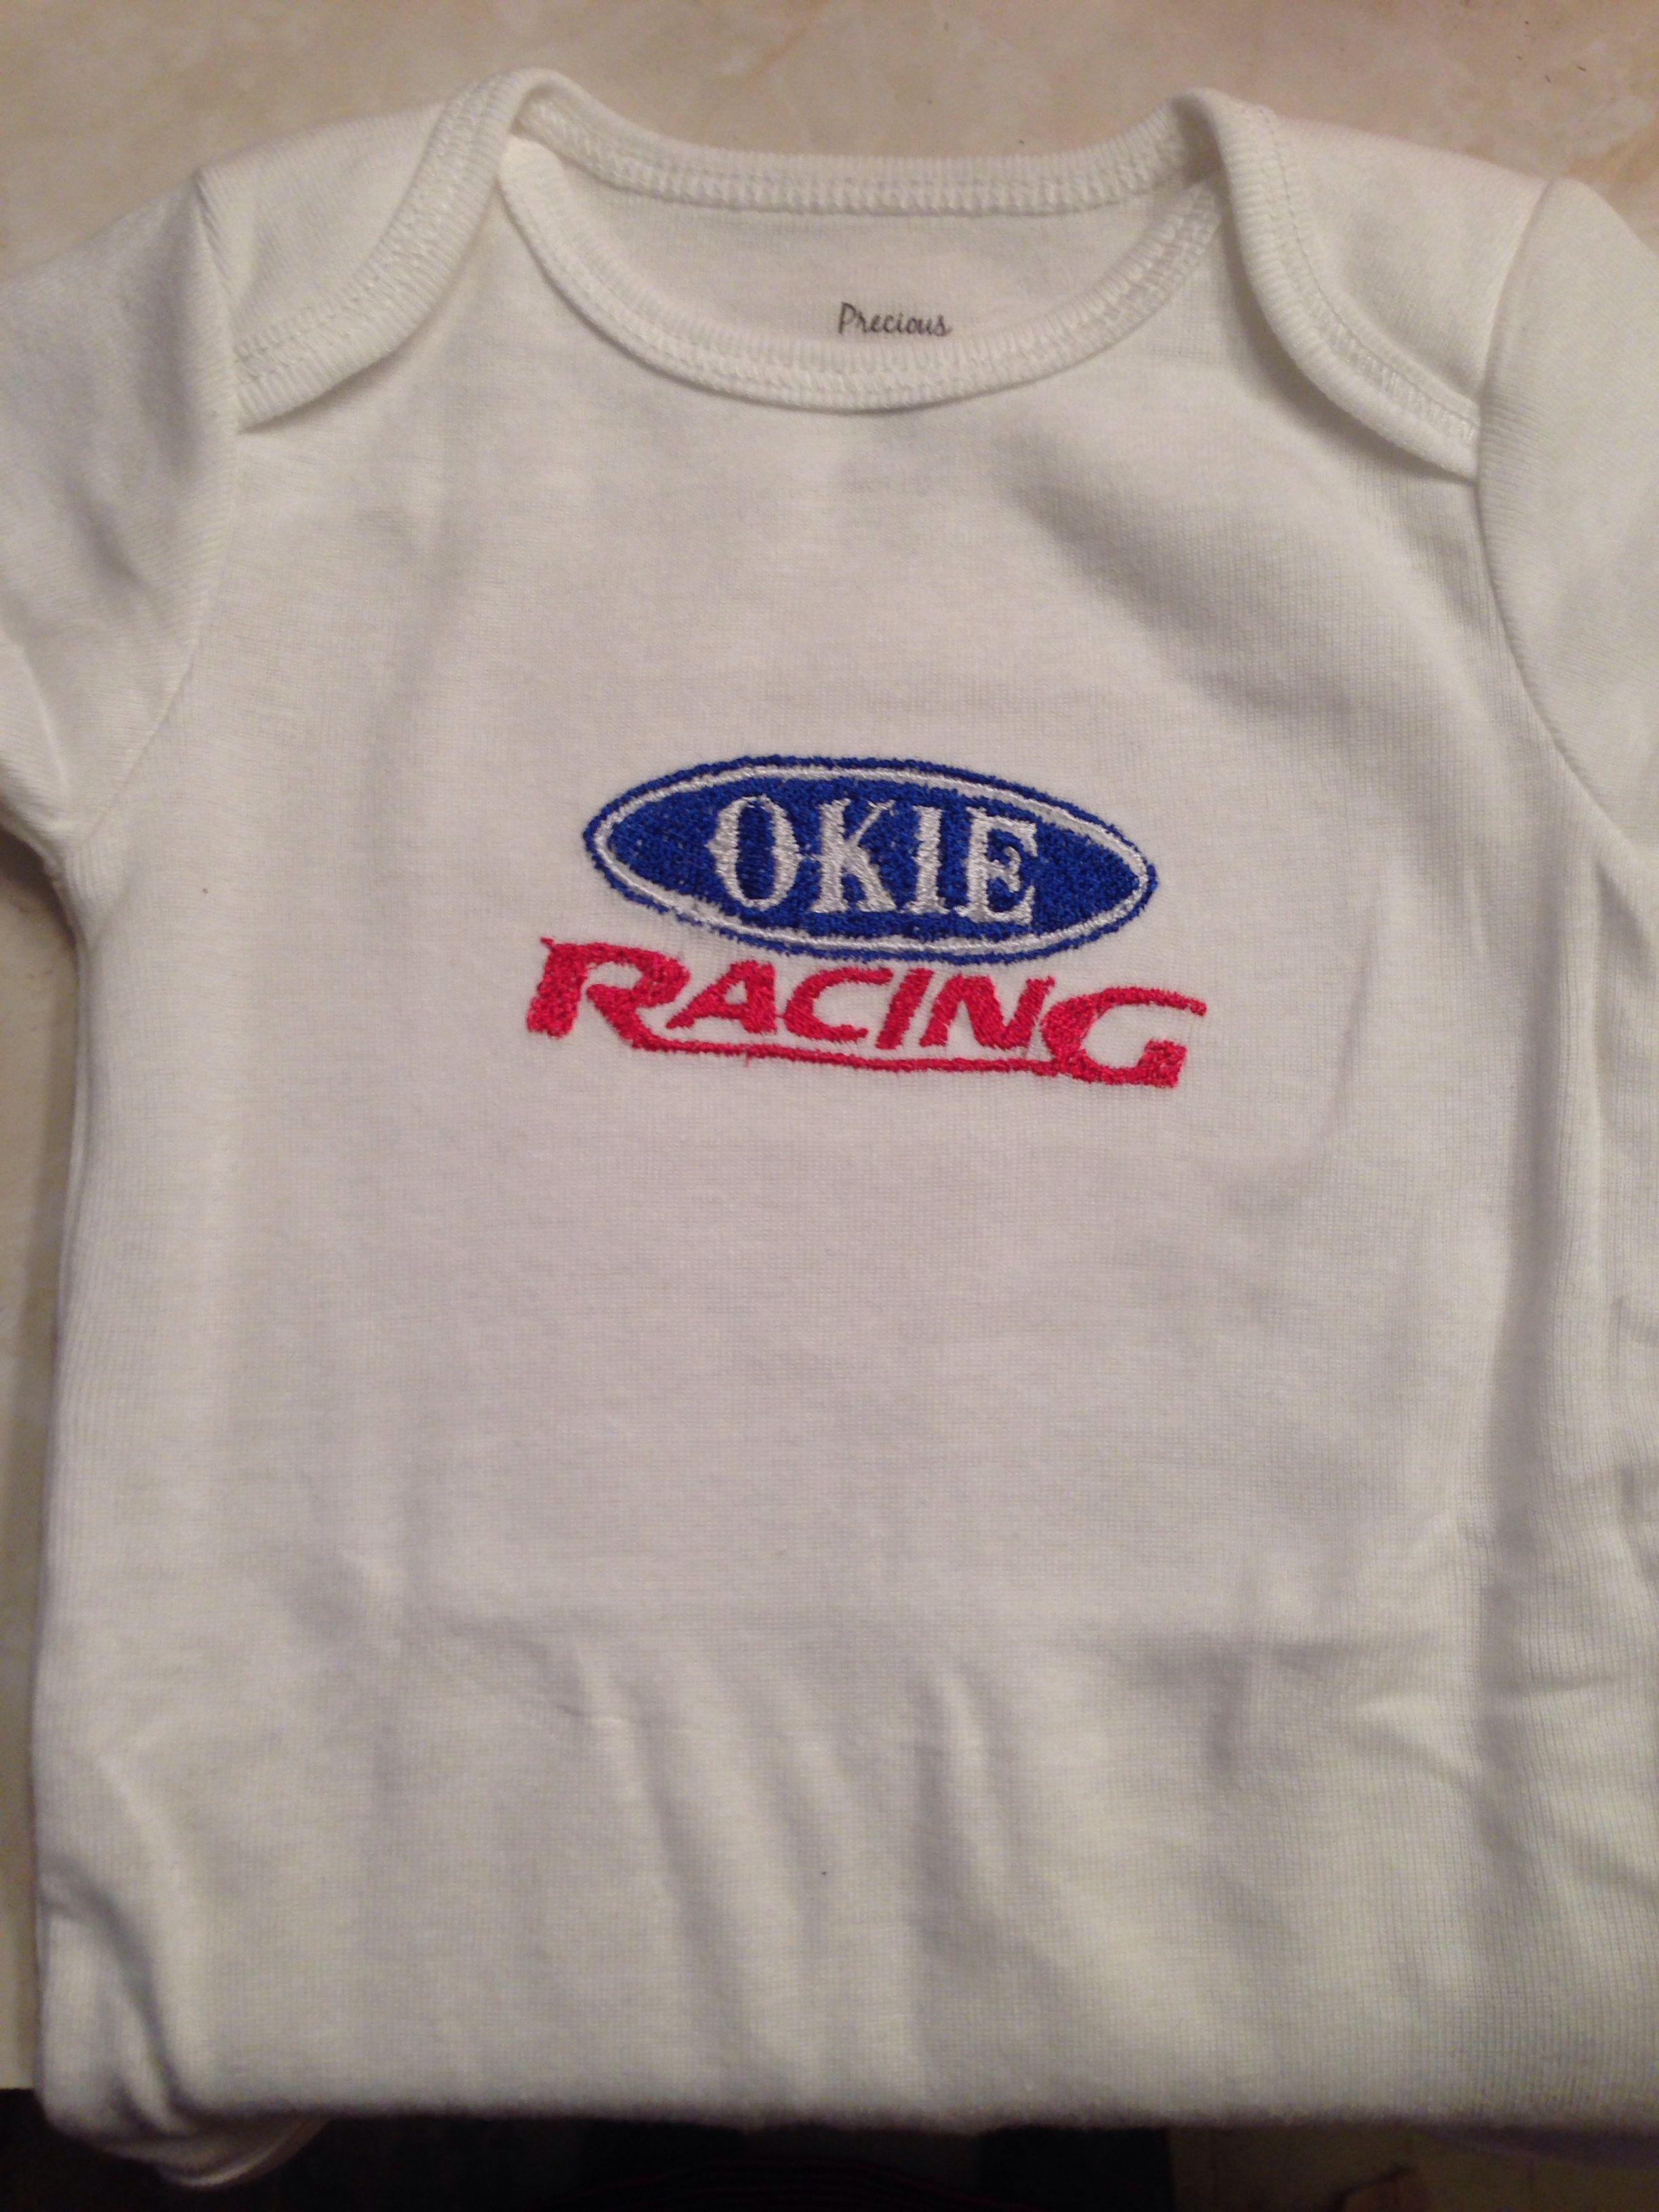 Okie Racing Onesie Embroidery Designs Pinterest Embroidery